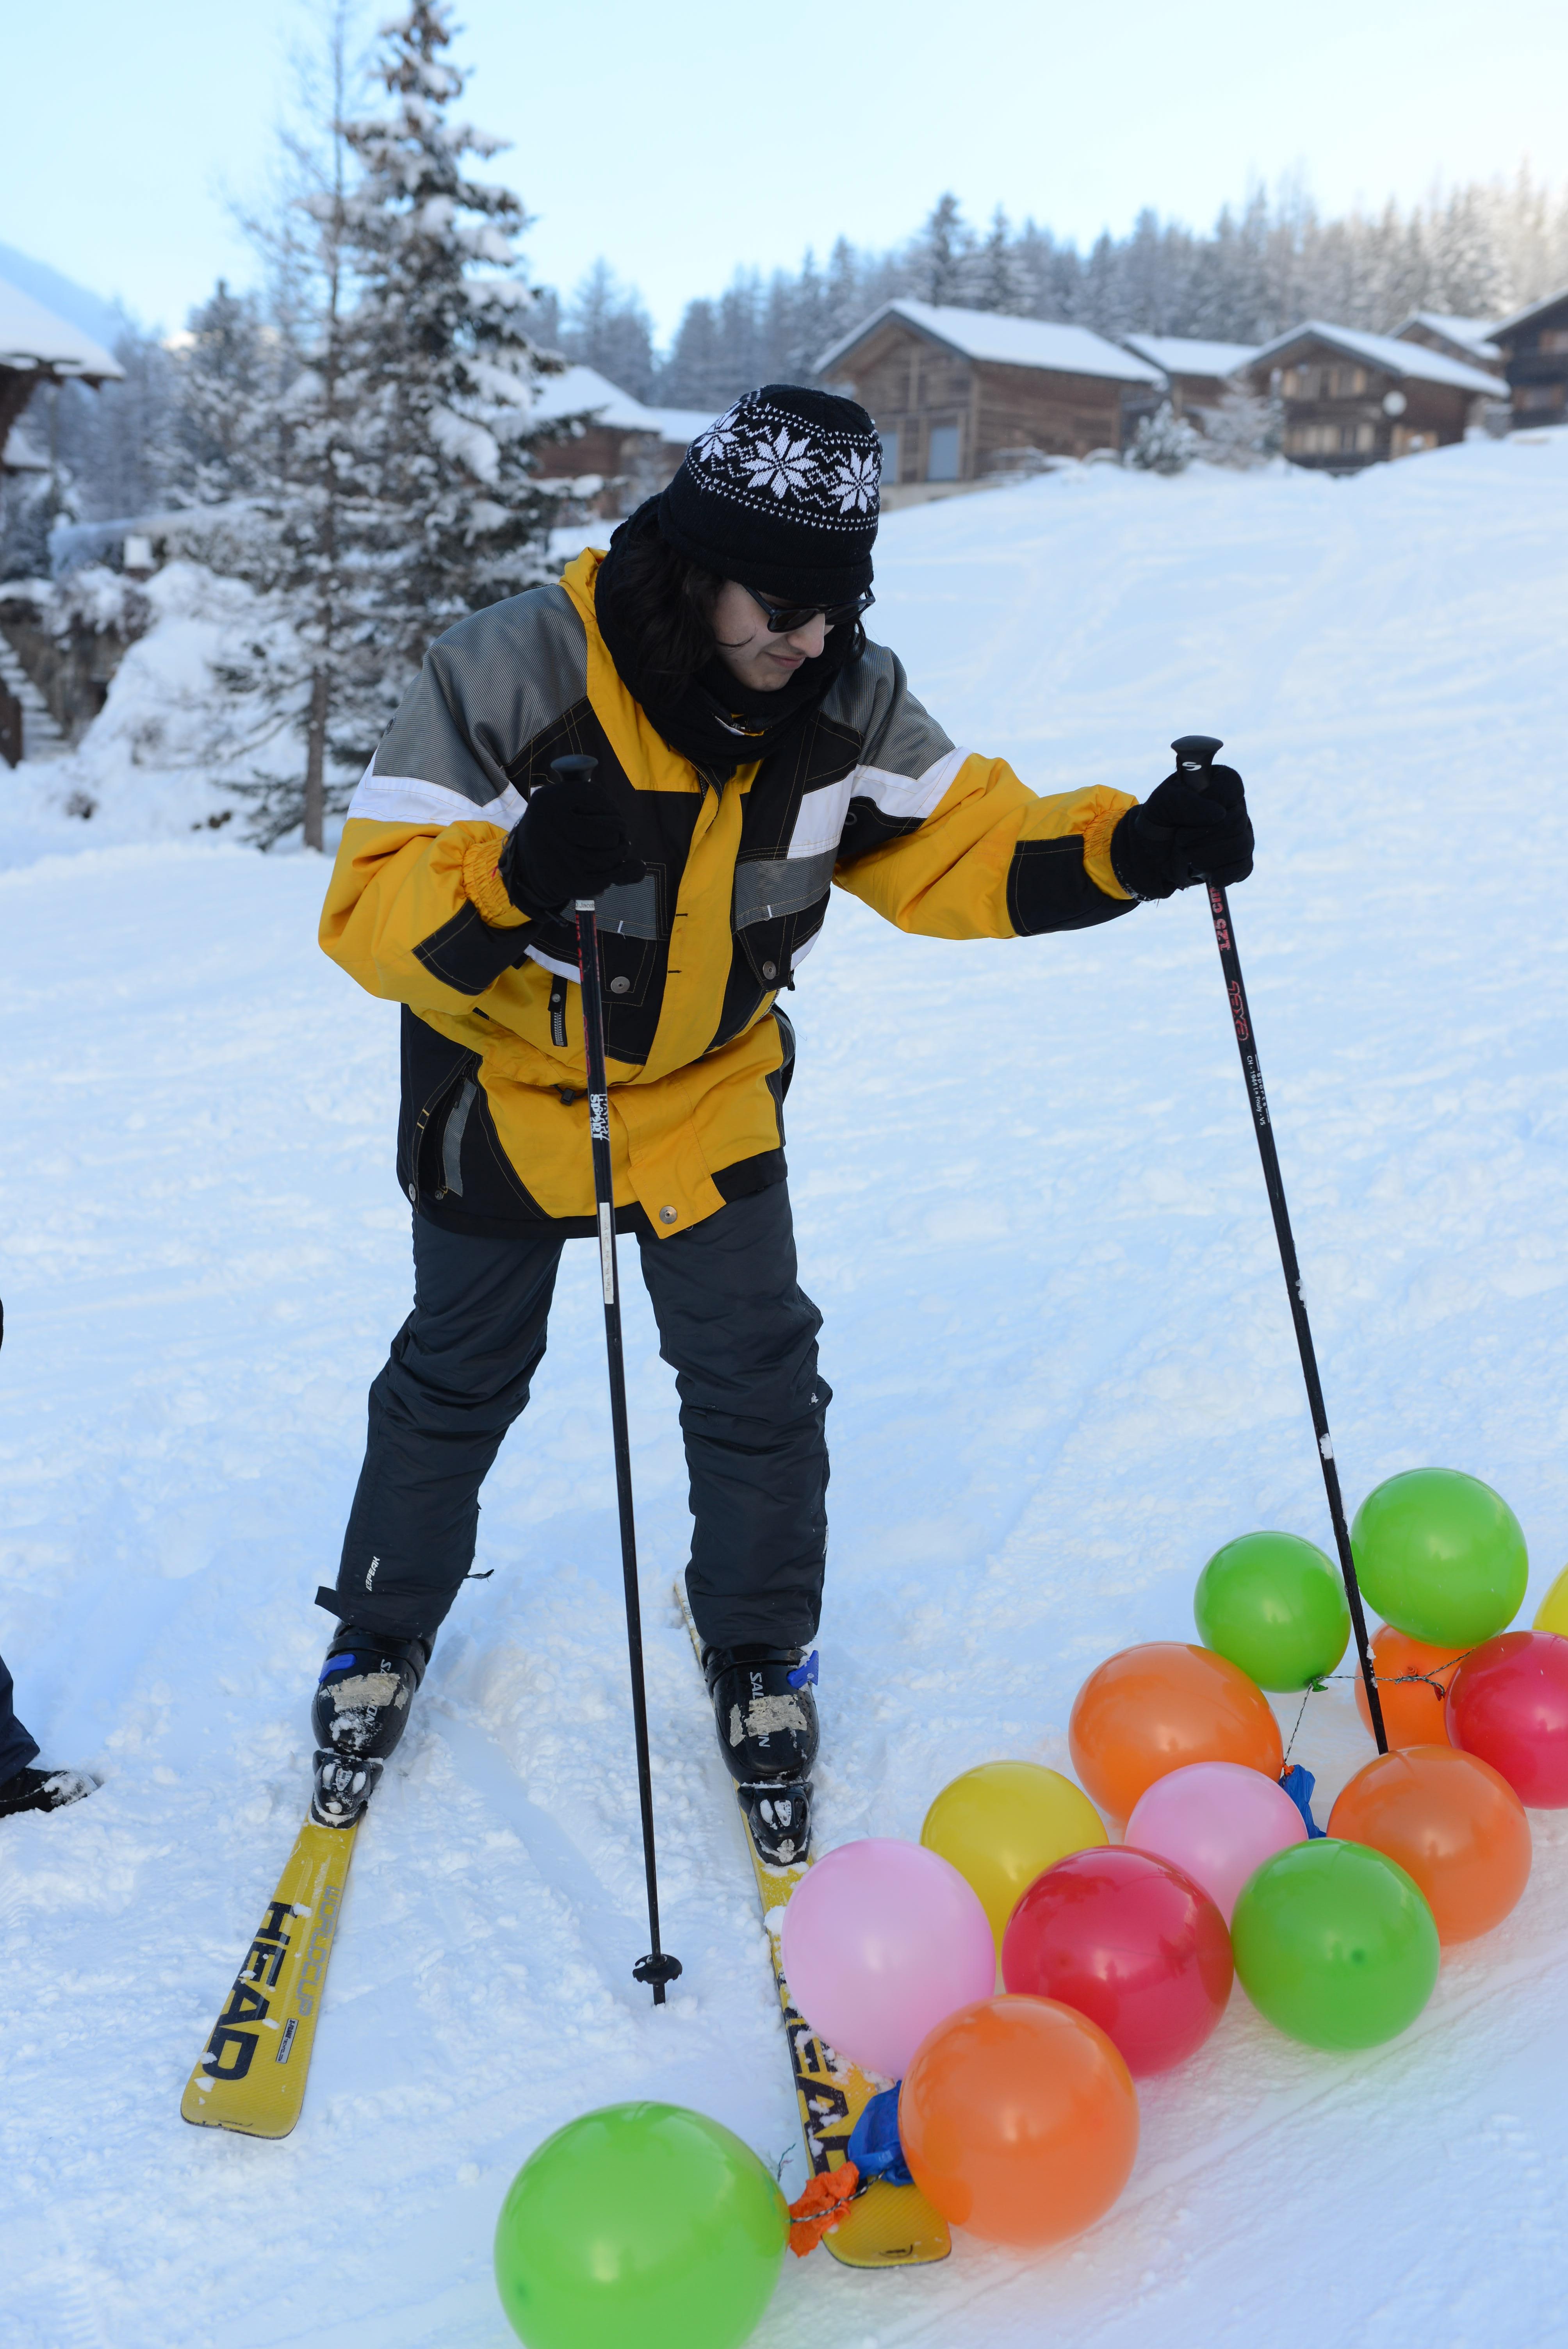 TitoMartínez in Aktion bei einem Slalom-Wettkampf.